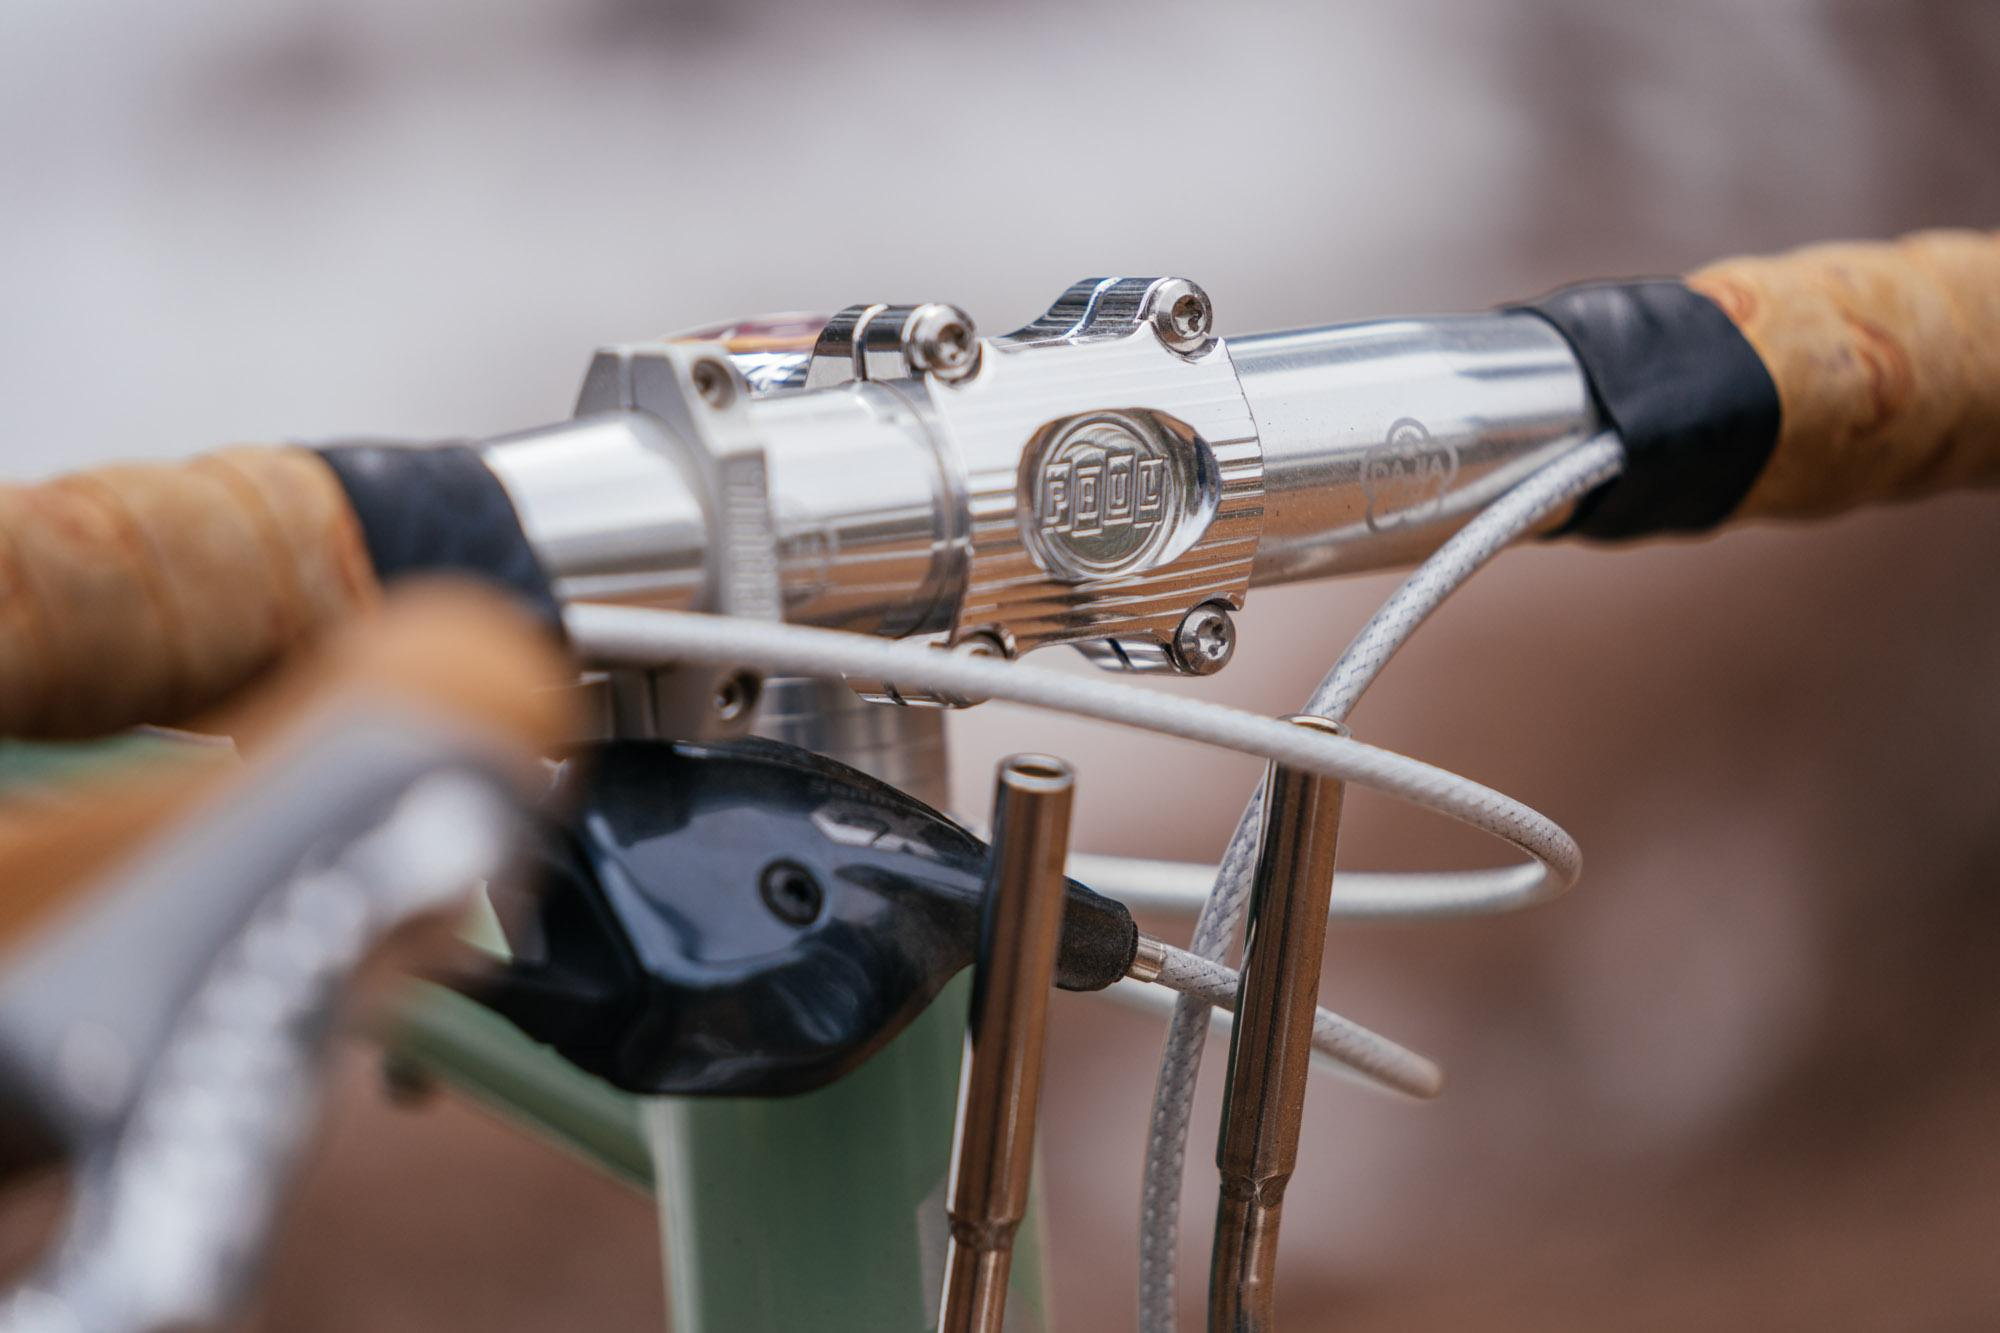 Baphomet Bicycles